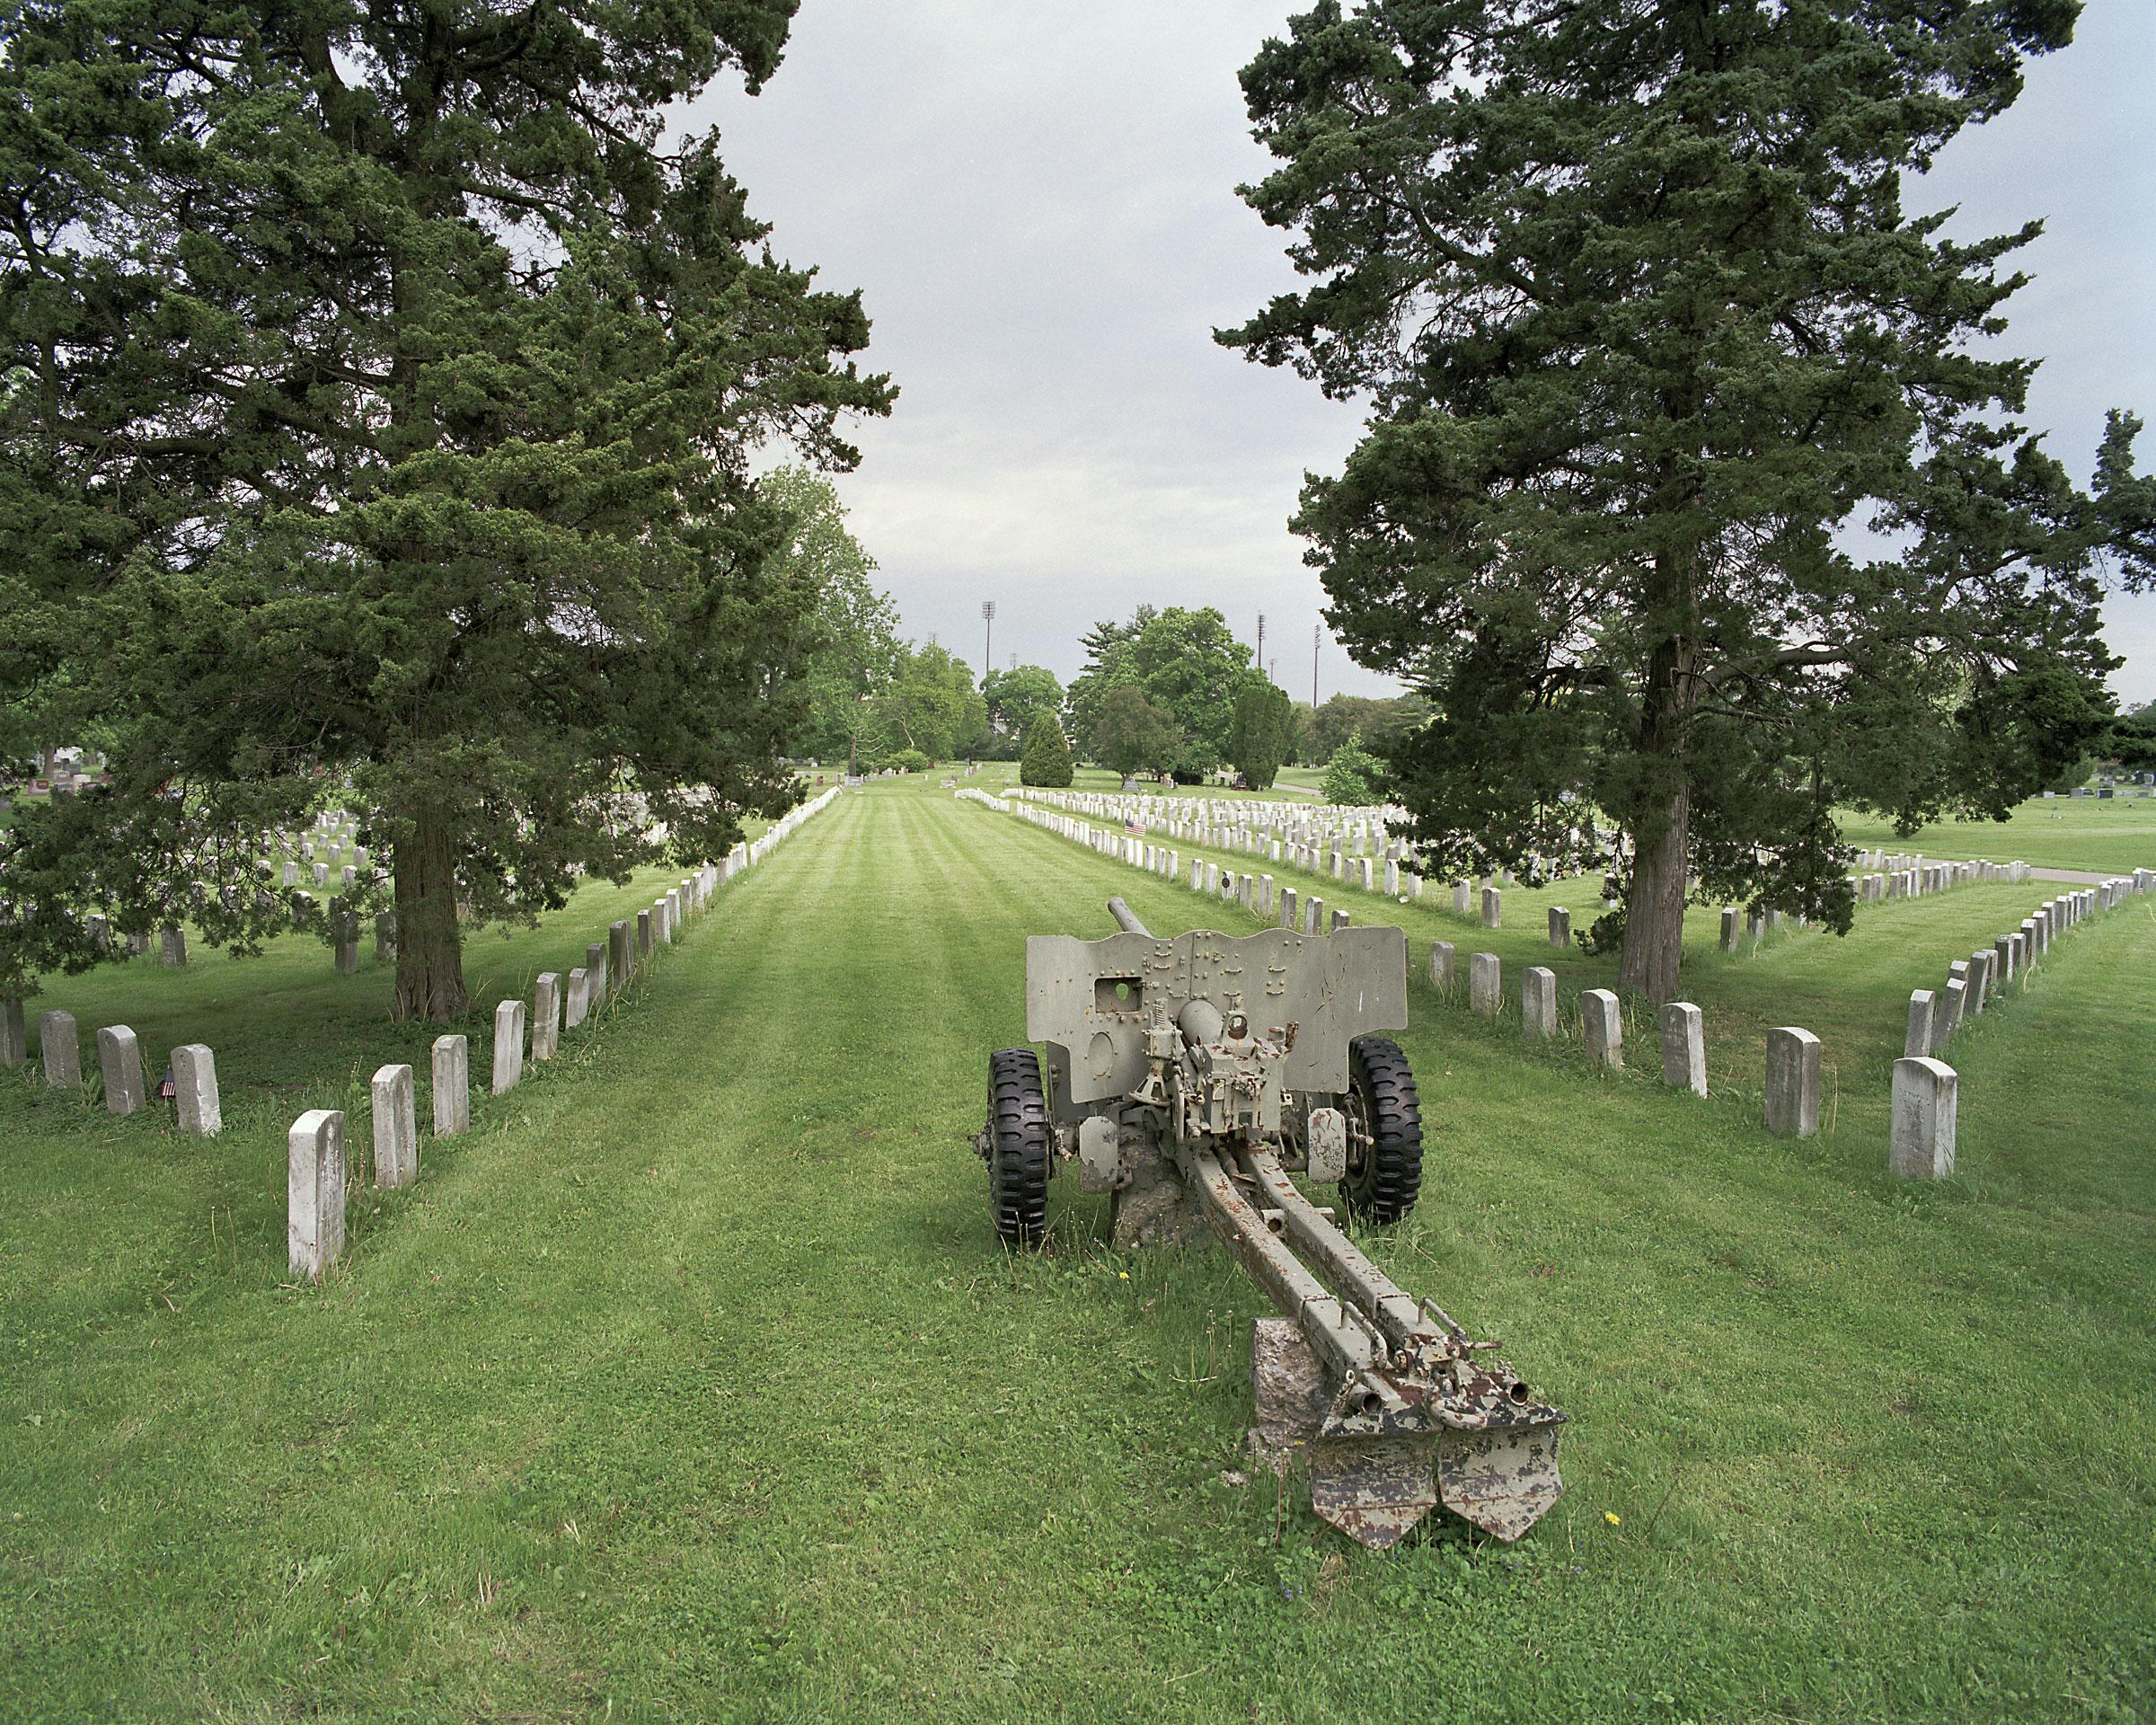 Artillery, Greenlawn Cemetery, Columbus, Ohio 2008.